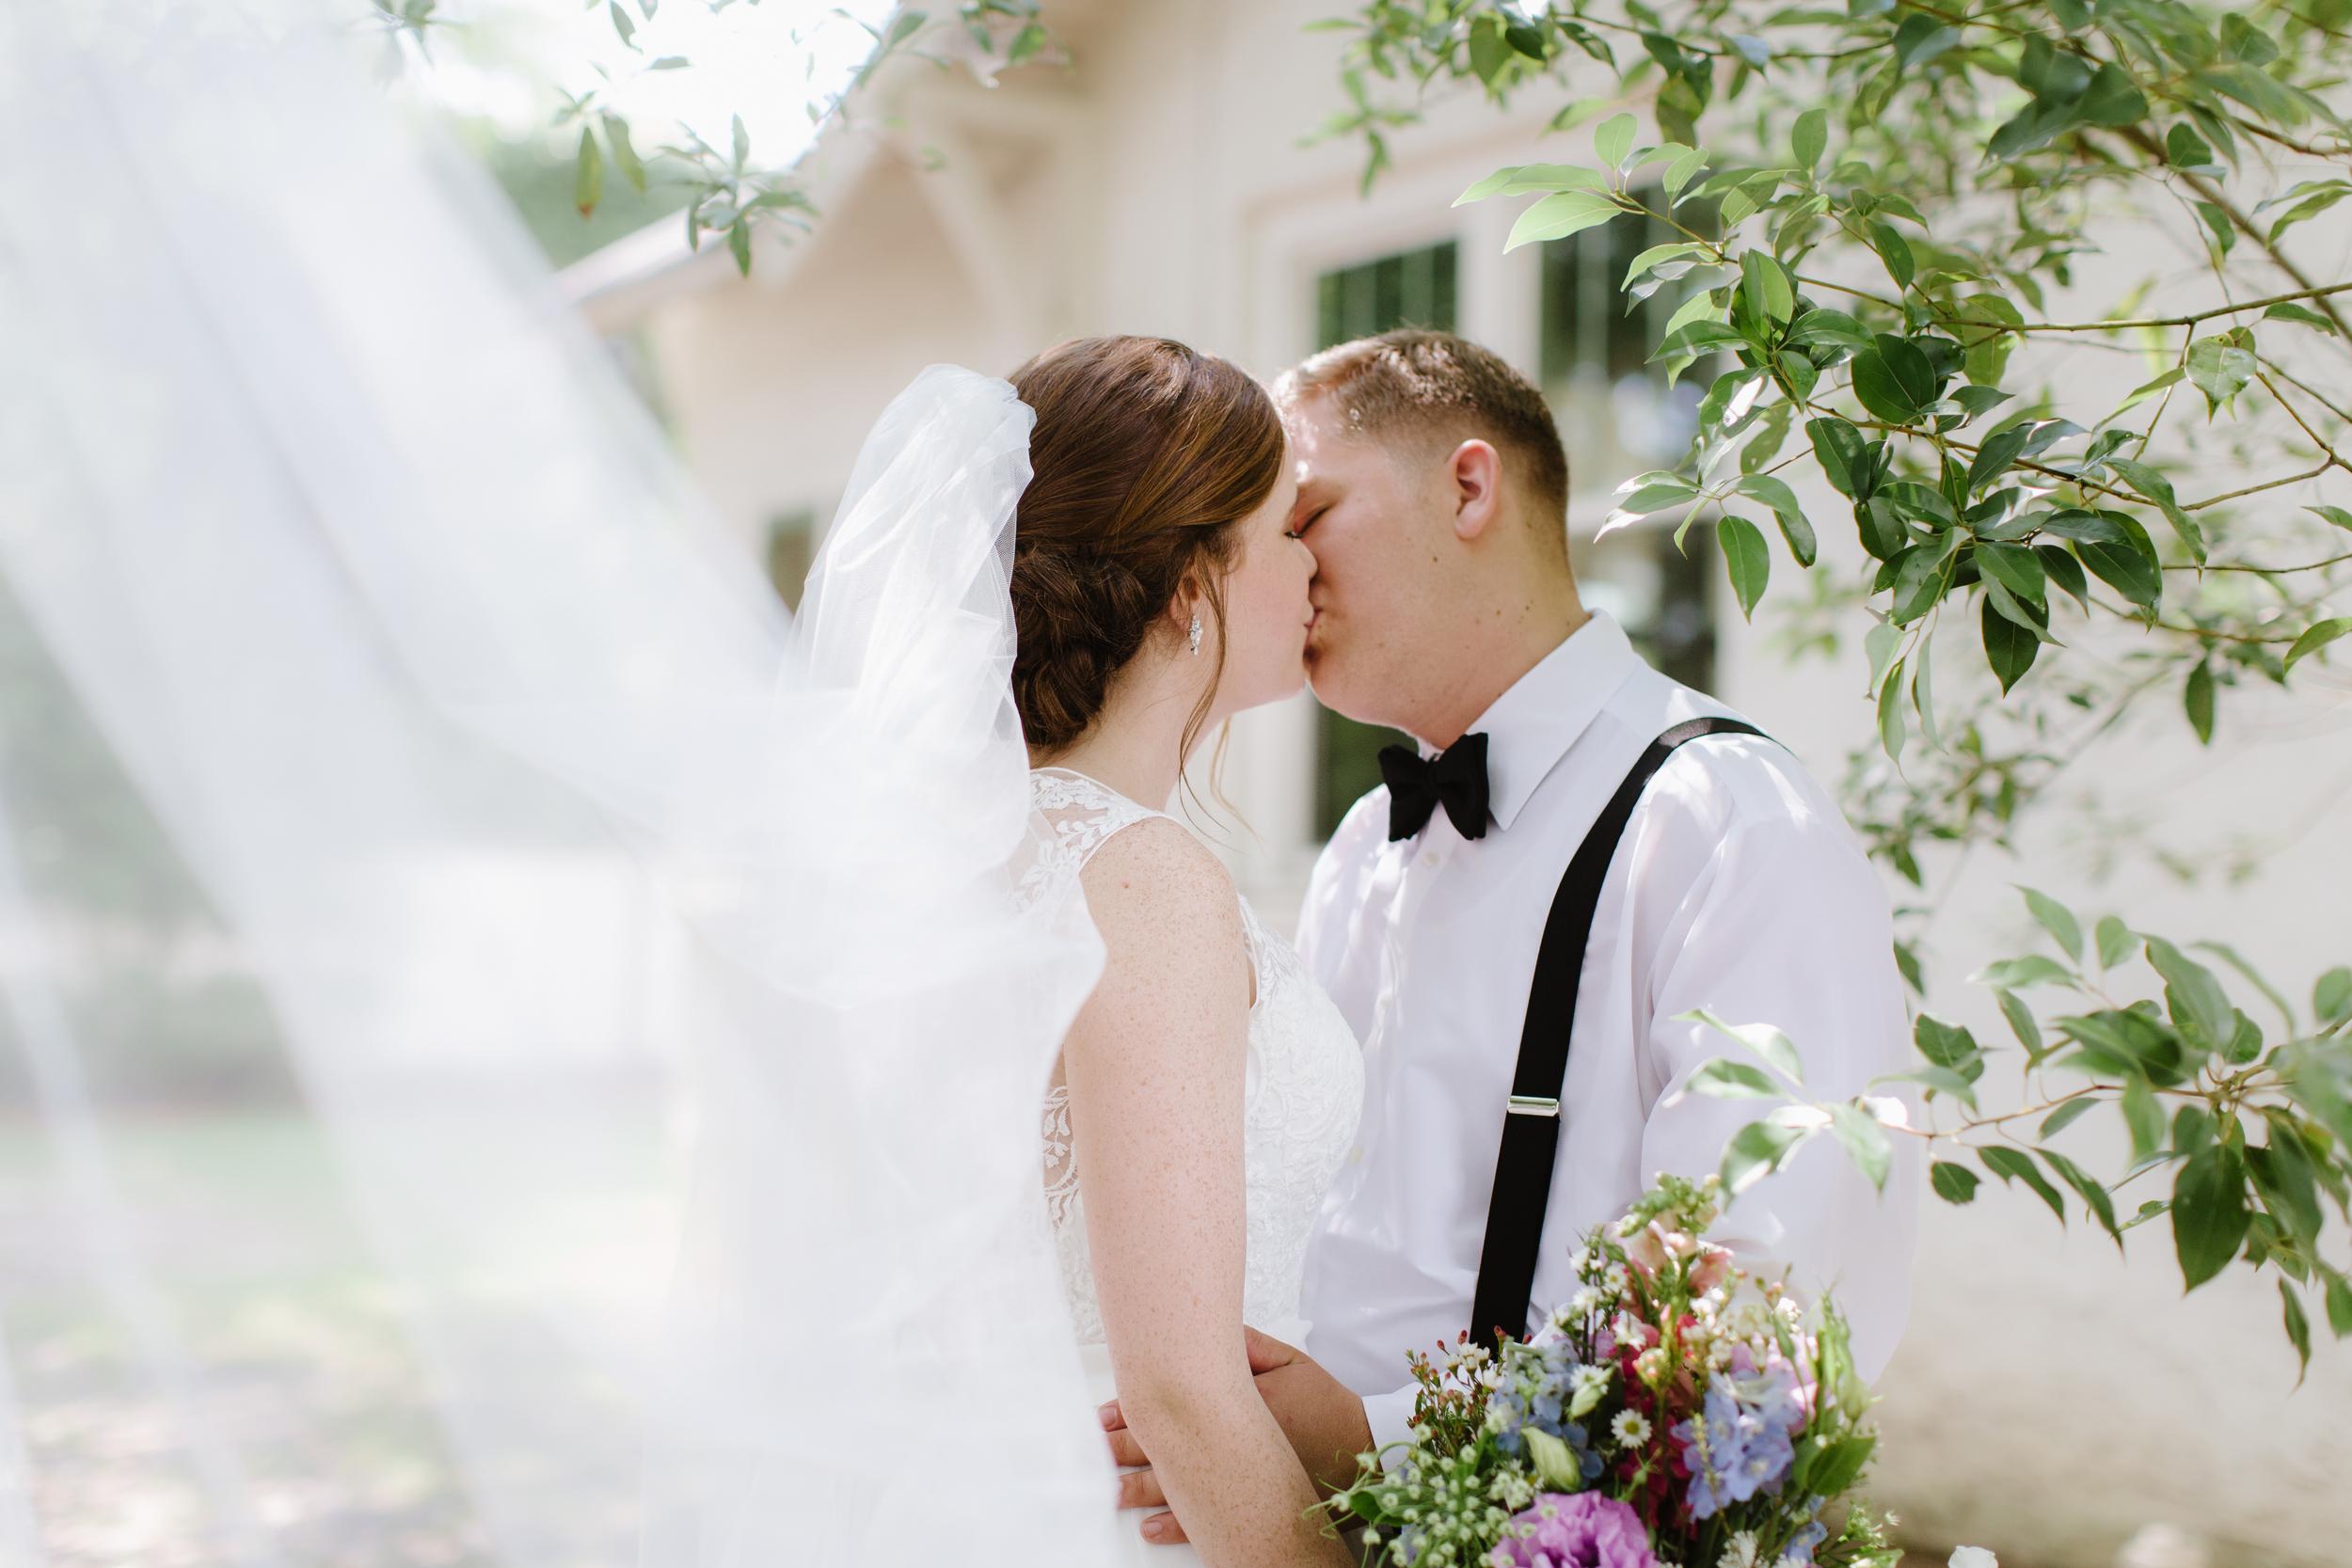 Dragonfly Photography | Wedding Photography in Baldwin County, Mobile, Fairhope, Orange Beach, Point Clear, Daphne, Fine Art Wedding Photography Alabama Weddings